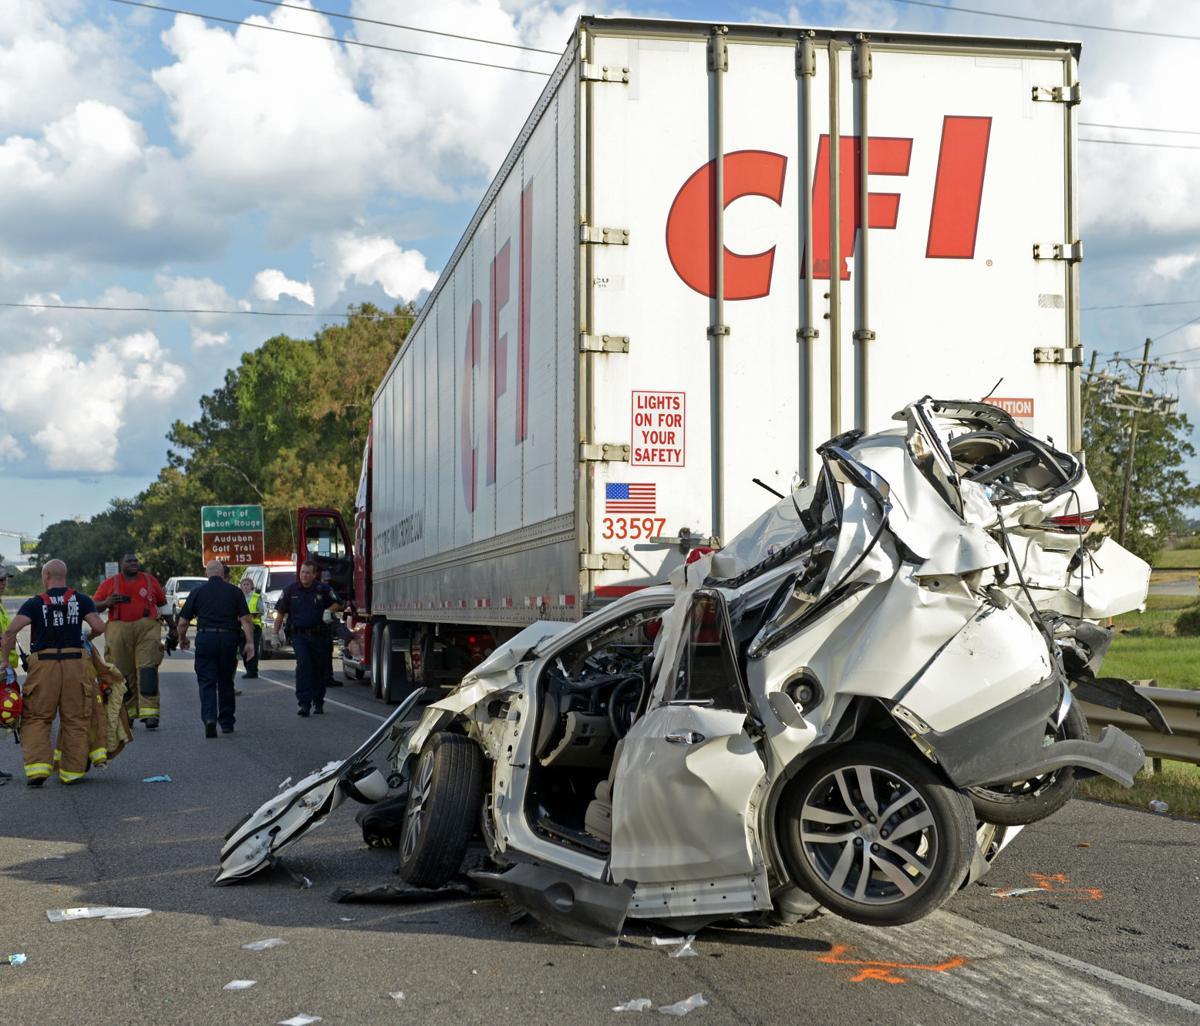 Multiple injured in major I-10 crash involving two 18